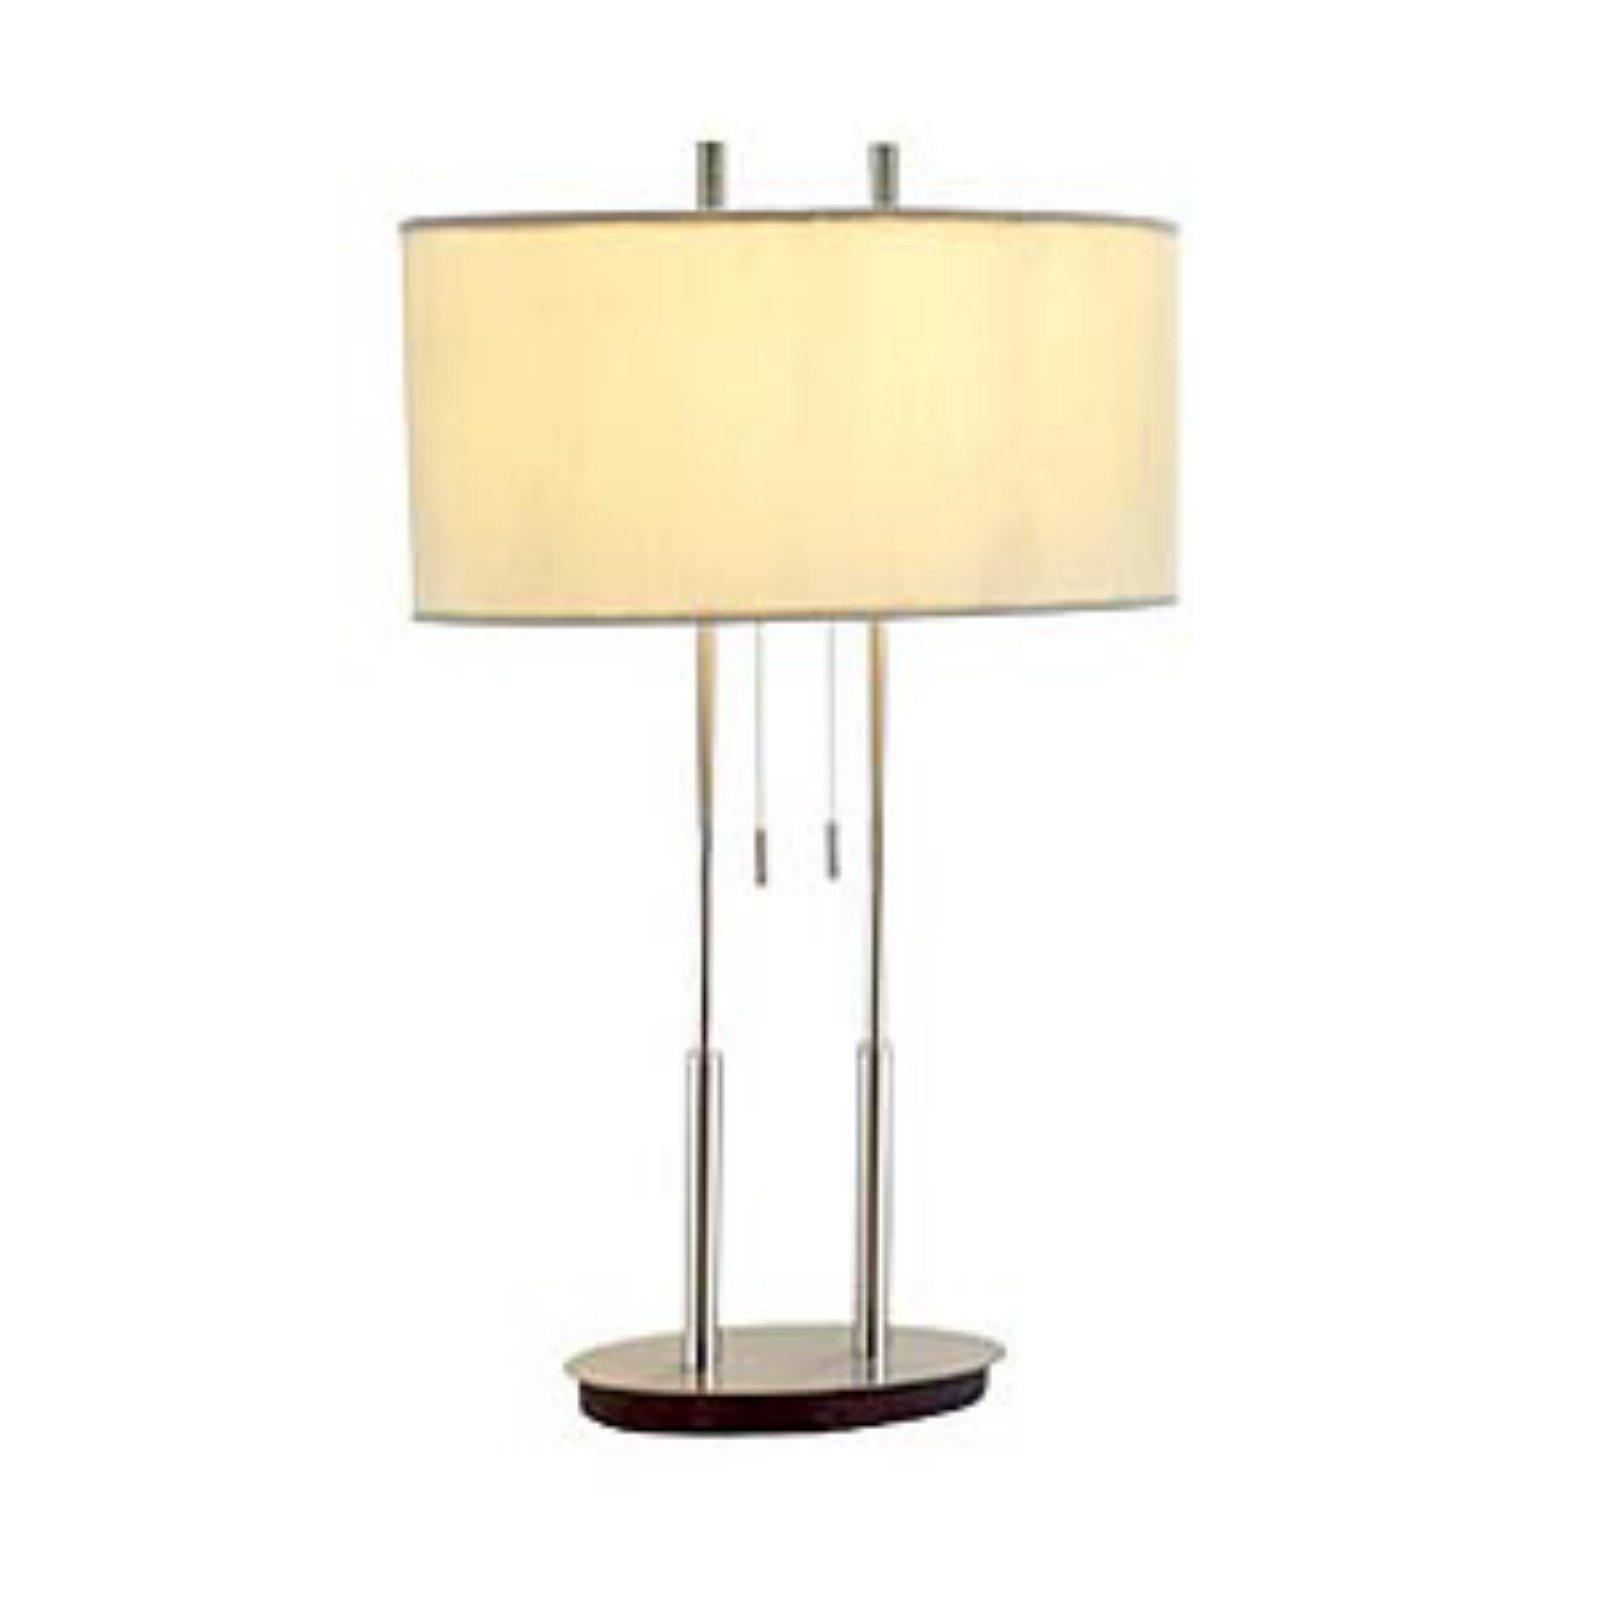 Adesso 4015 Duet Desk Lamp